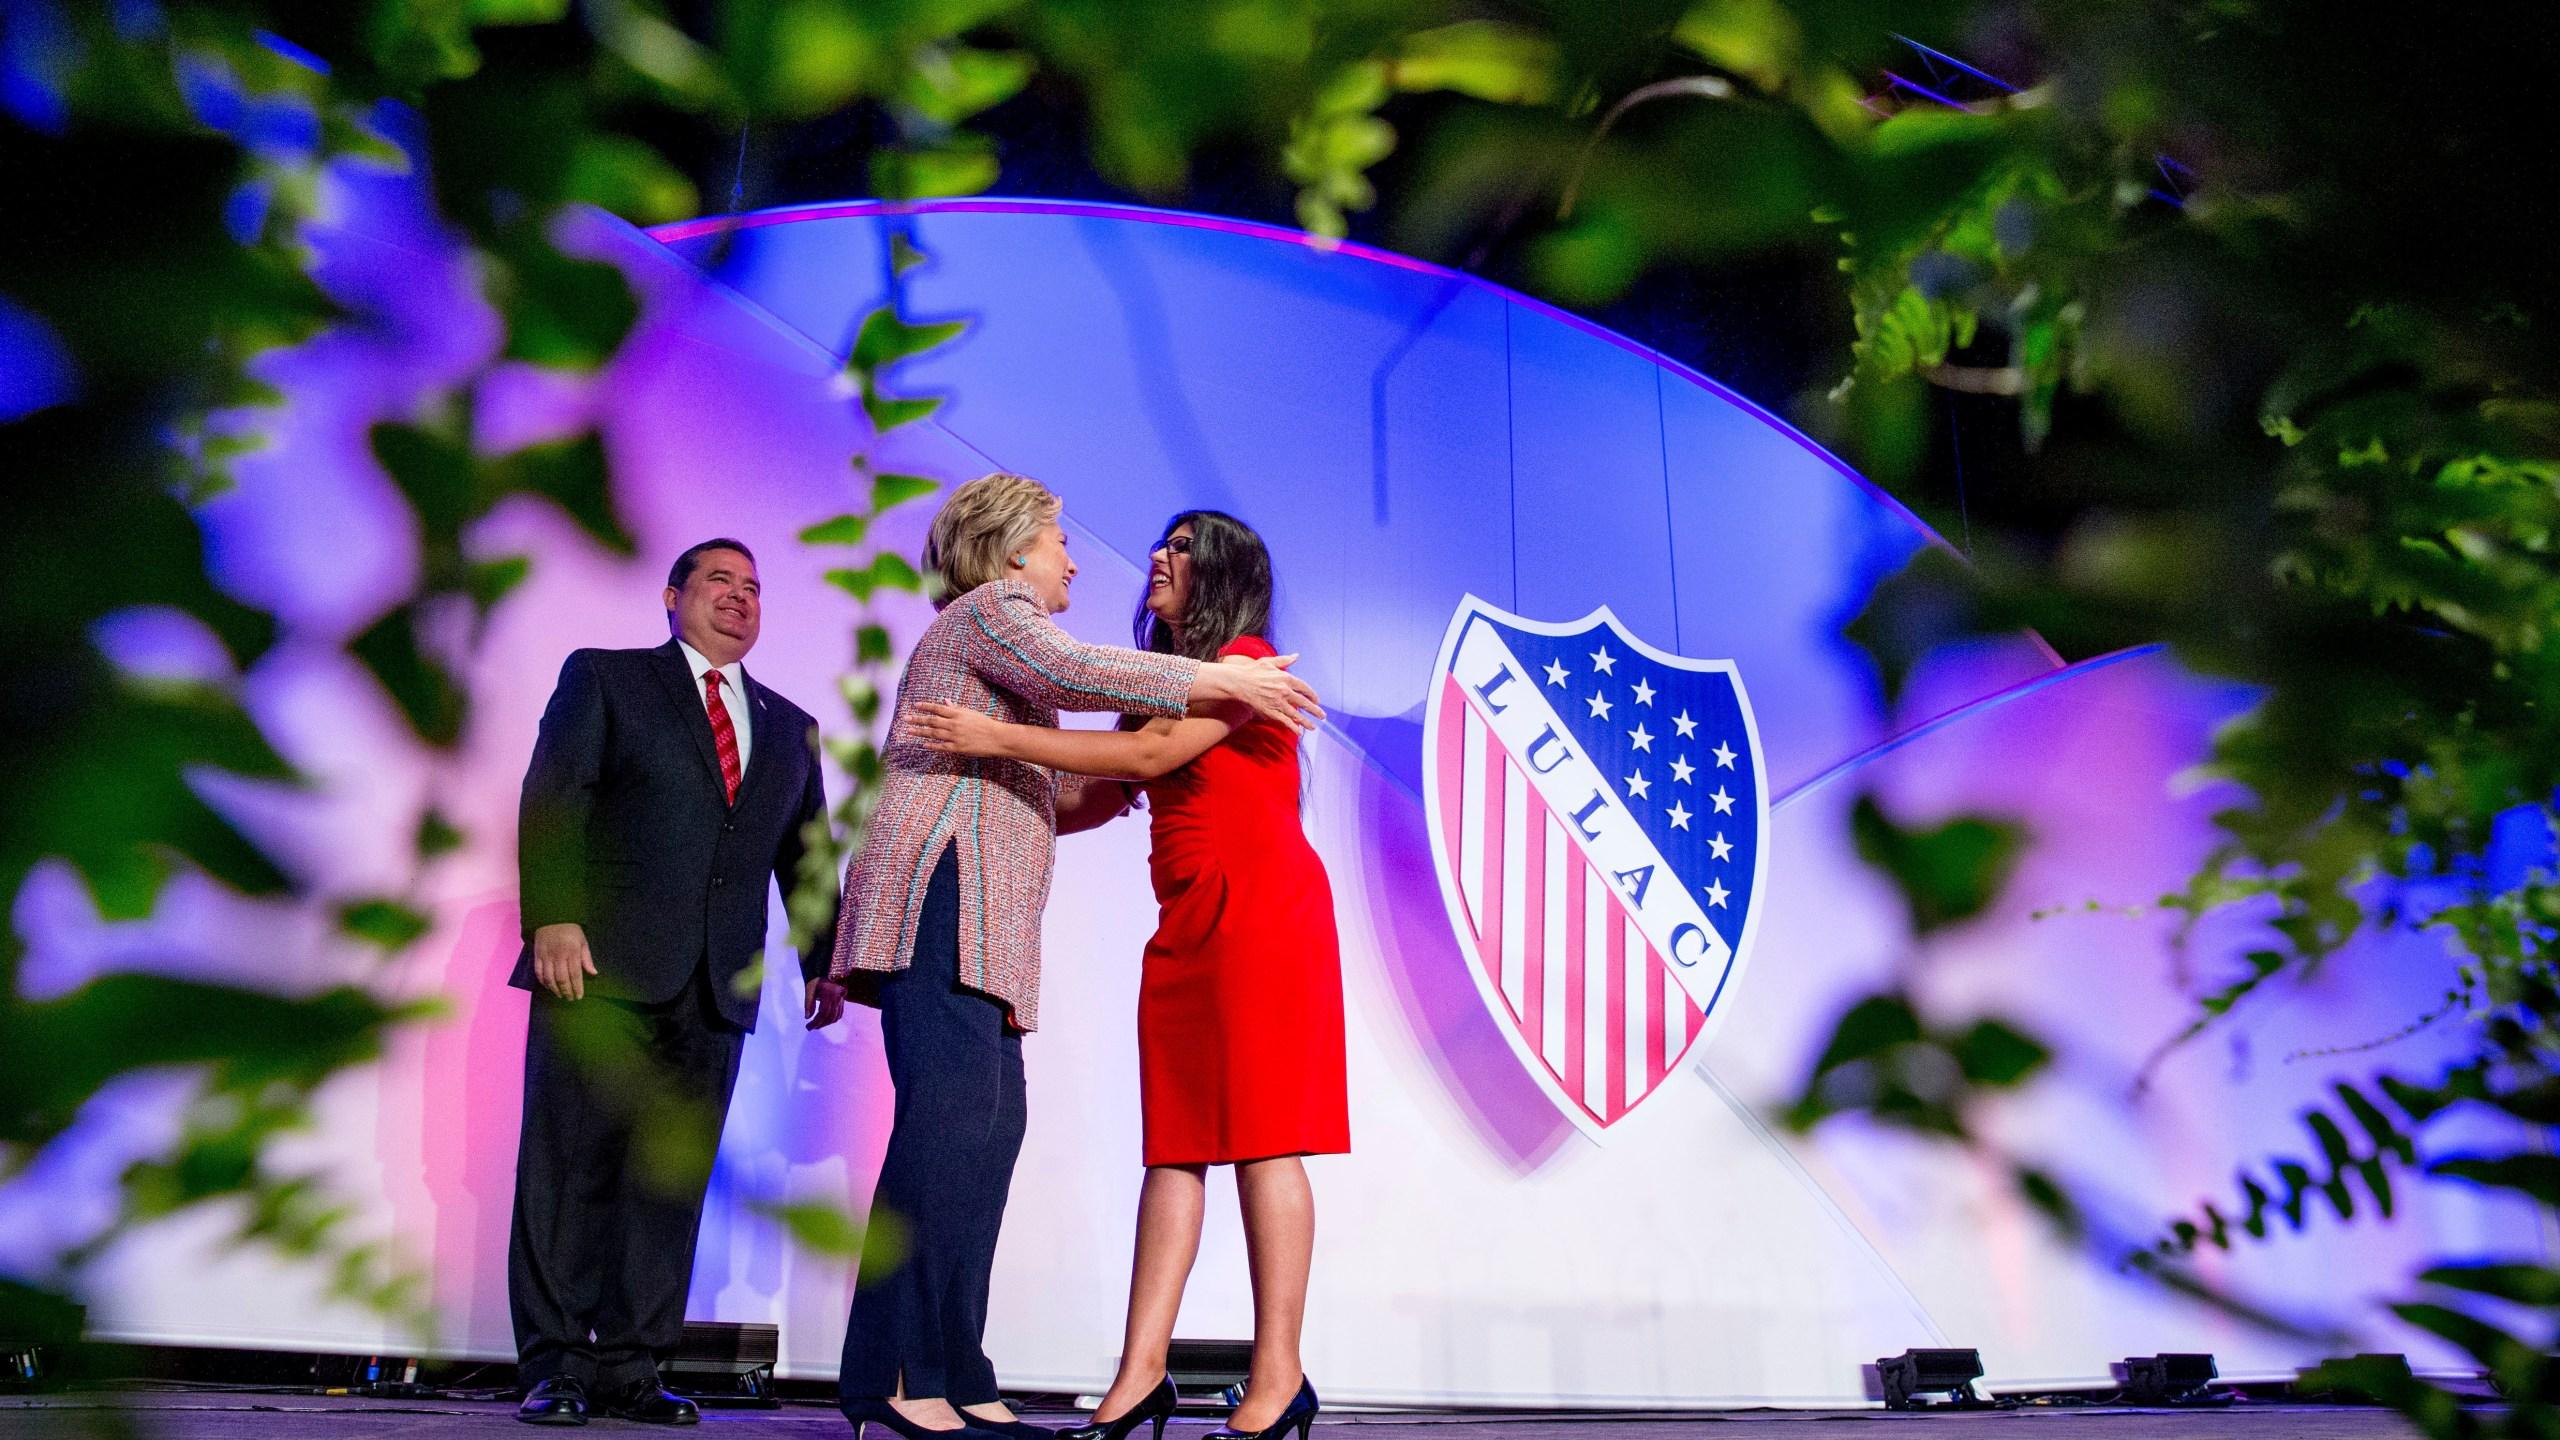 Hillary Clinton, Roger C. Rocha, Lizeth Urdiales